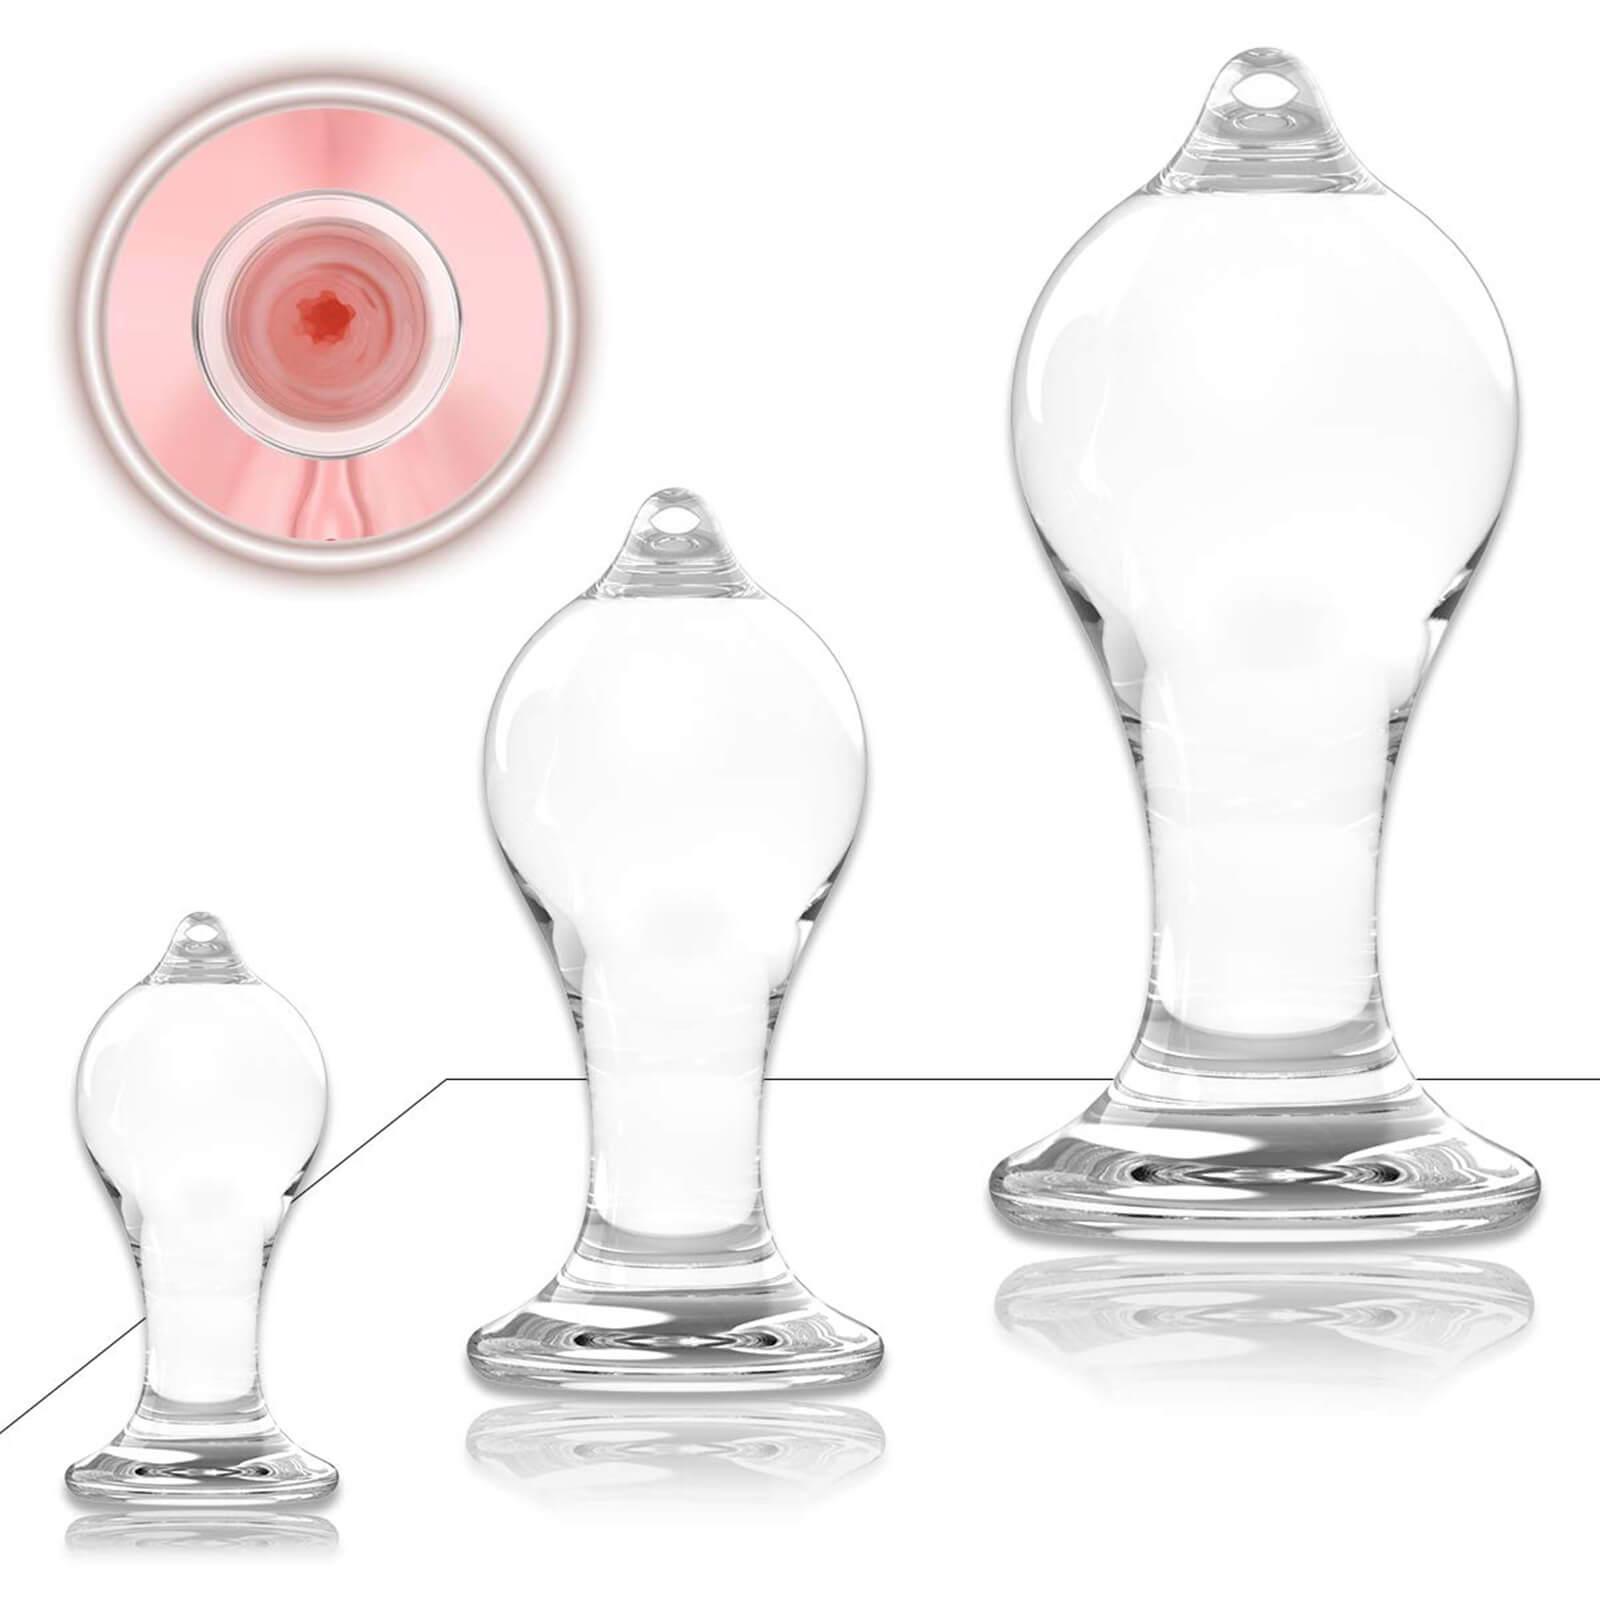 Hitinight Transparent Crystal Anal Plugs Trainer Kit